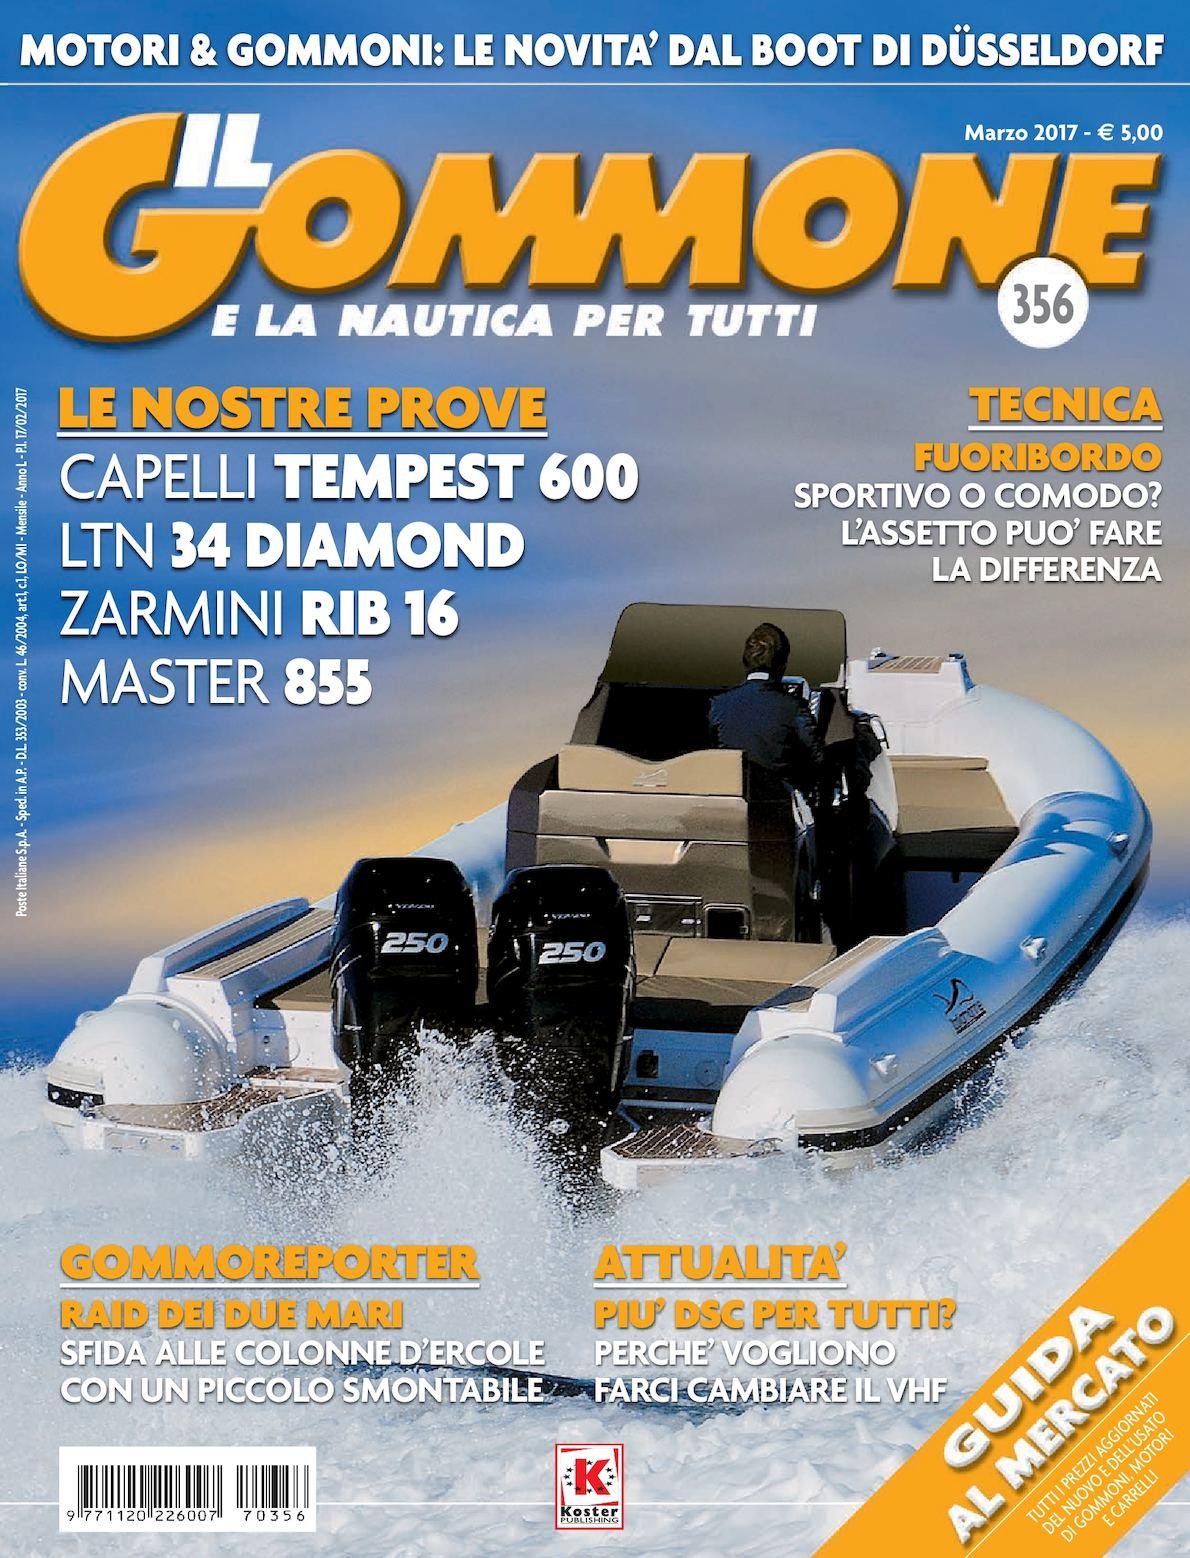 Il Gommone n. 356